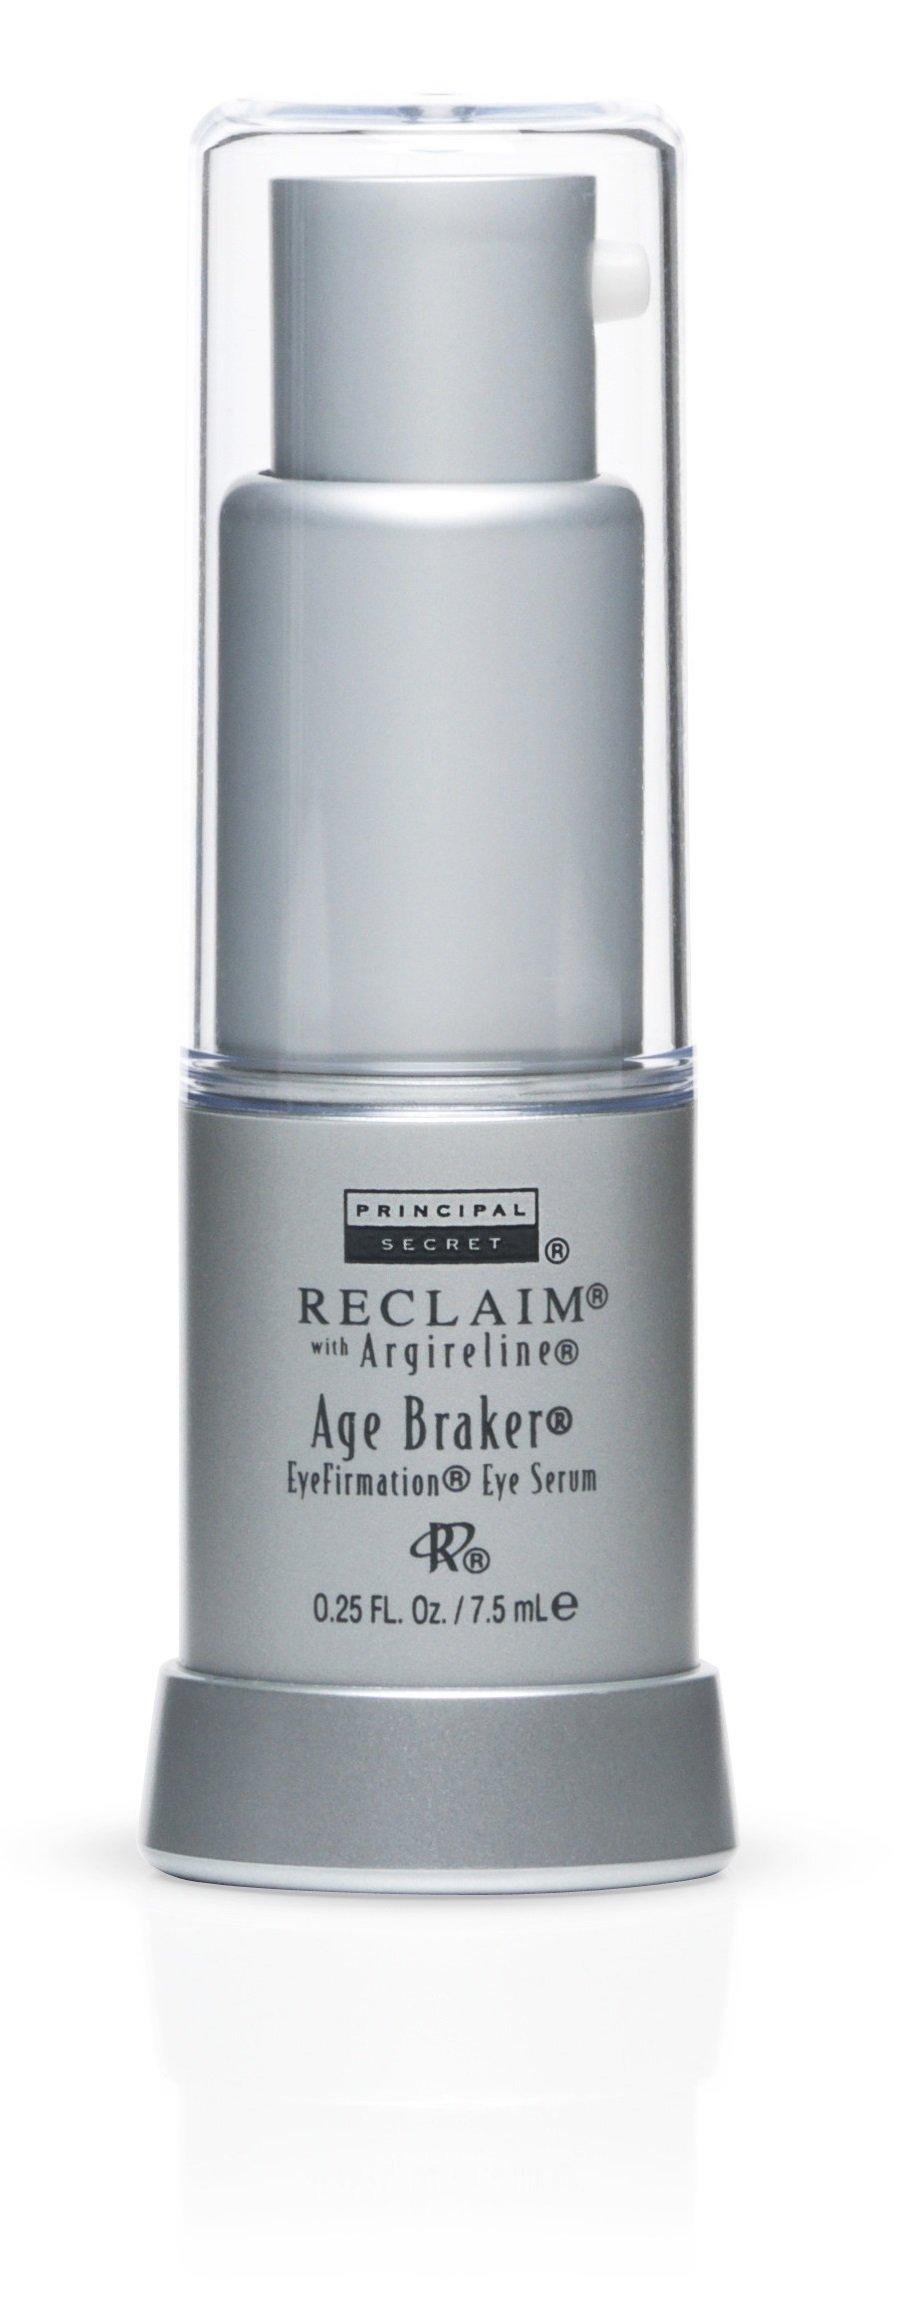 Principal Secret – Reclaim with Argireline – Age Braker EyeFirmation Eye Serum – Aloe & Shea Butter Infused – Travel Size 30 Day Supply/0.25 Ounce